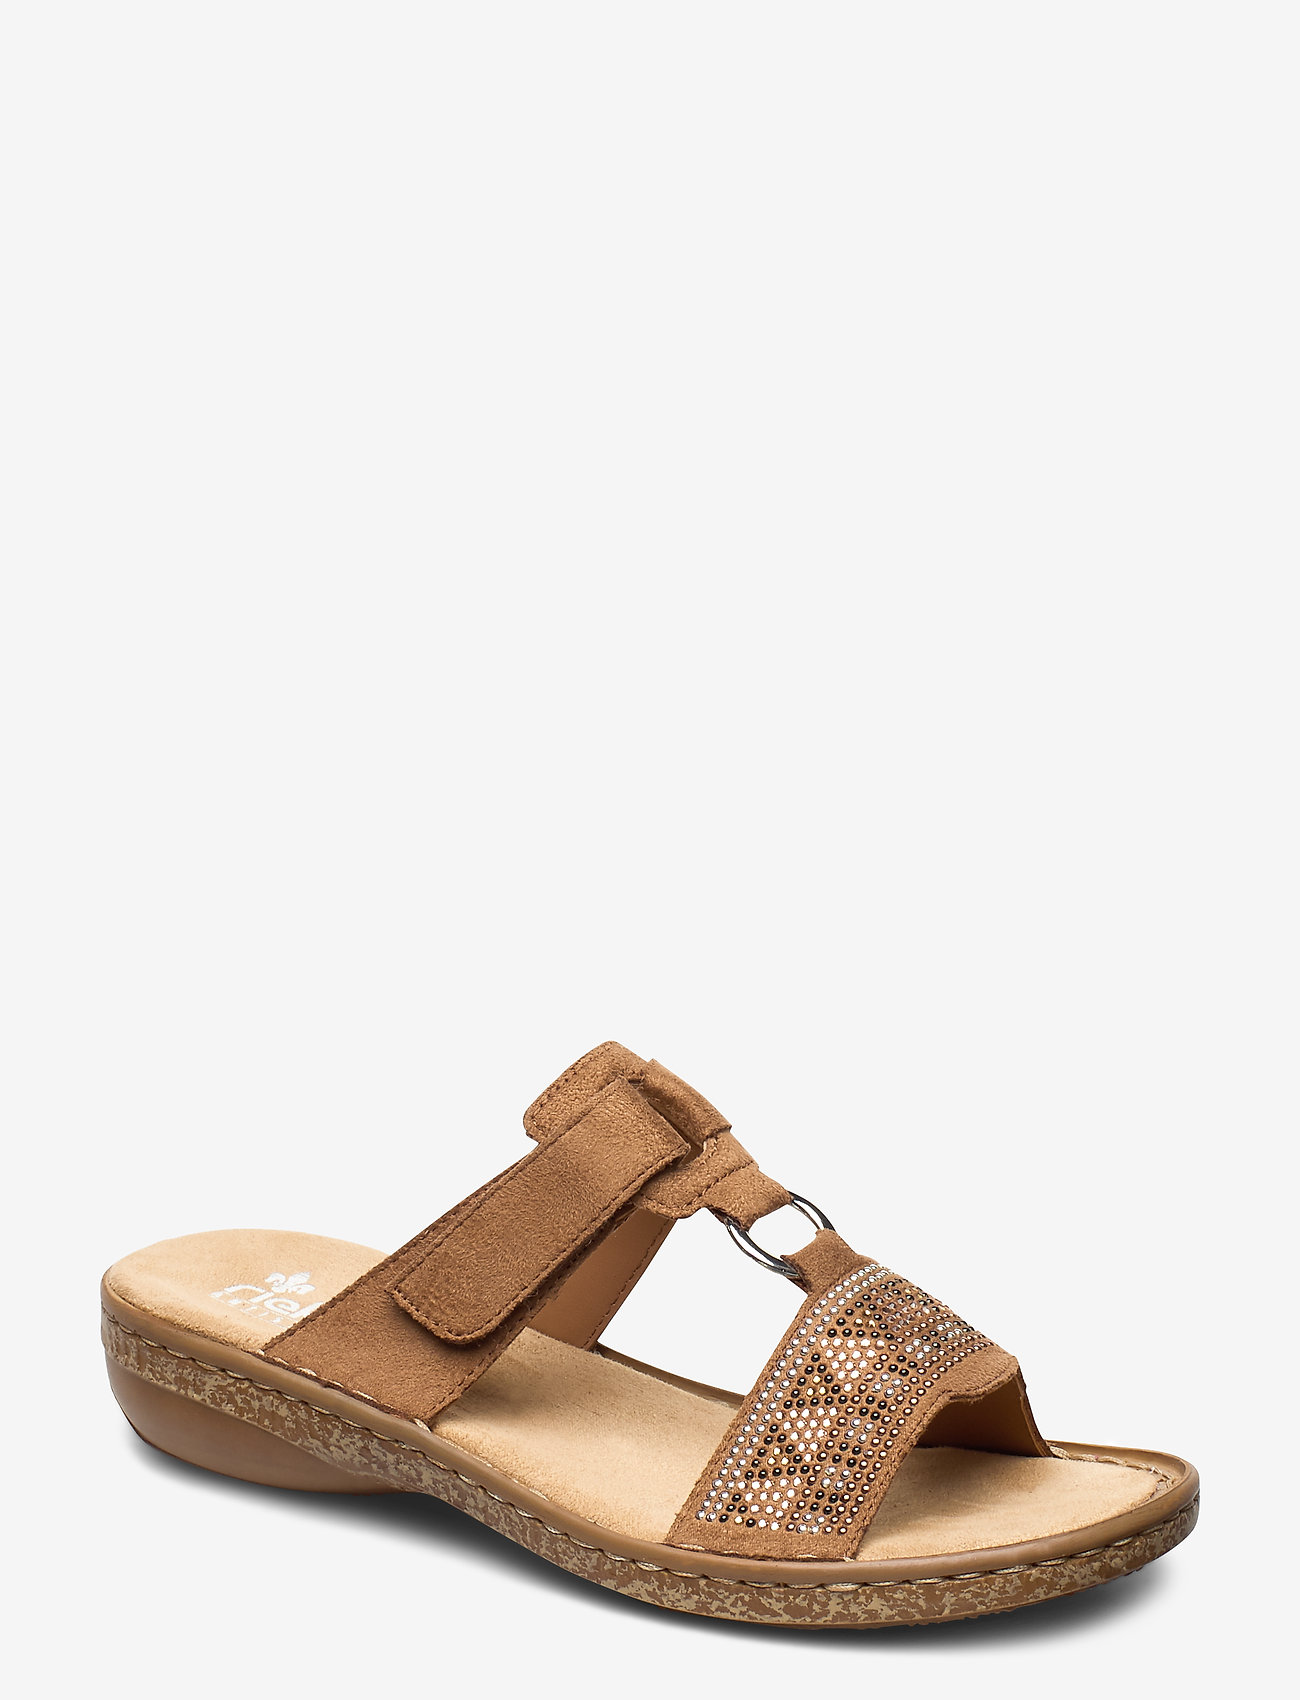 Rieker - 628M0-22 - flat sandals - brown